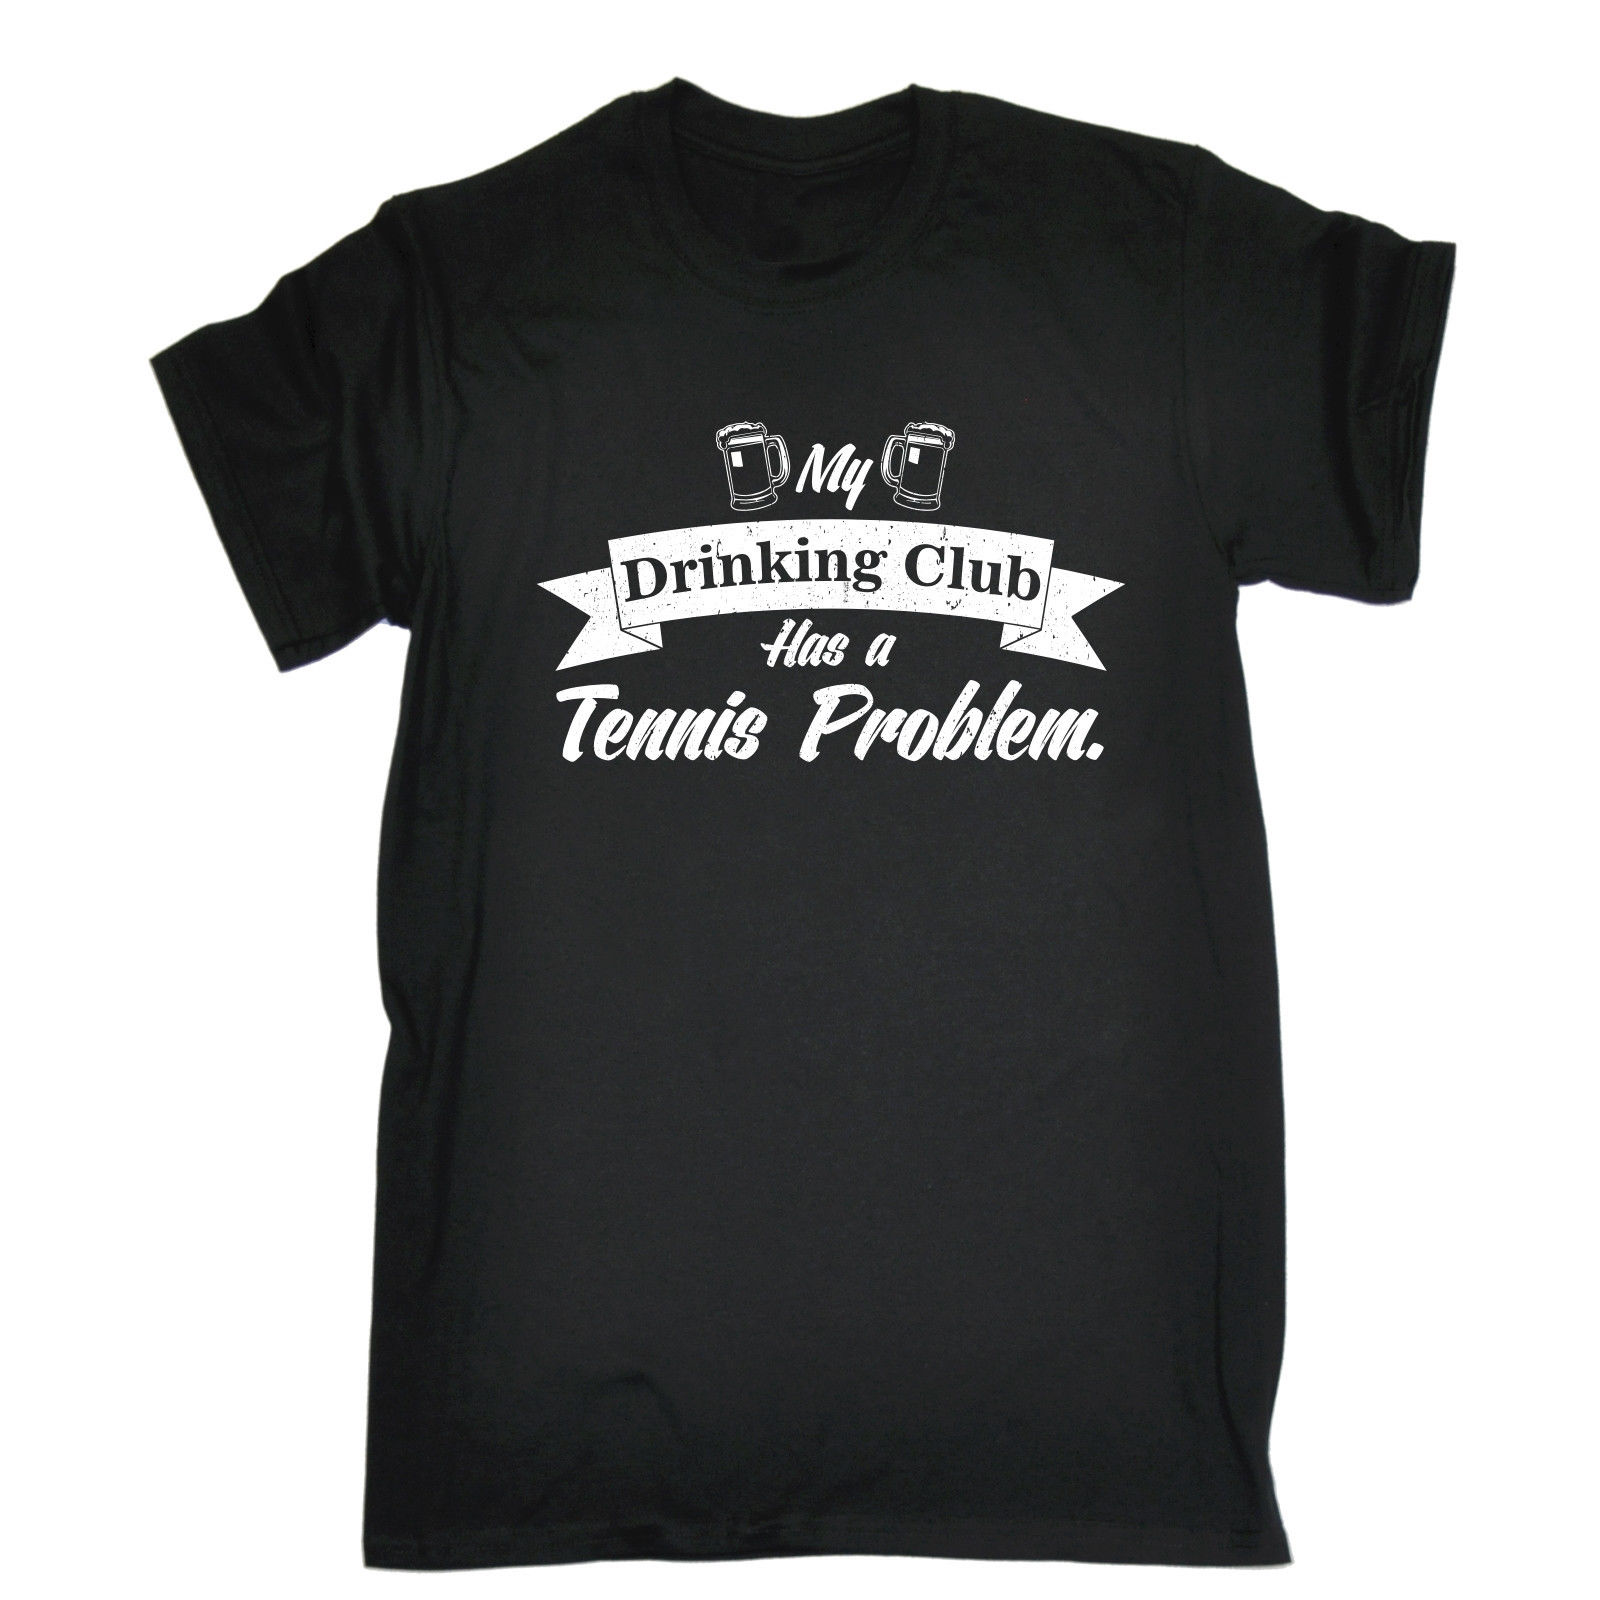 My Drinking Club Has A Tenniser Problem T-SHIRT Racquet Ball Funny Gift Birthday T-Shirt Fashiont Shirt Free Shipping Top Tee